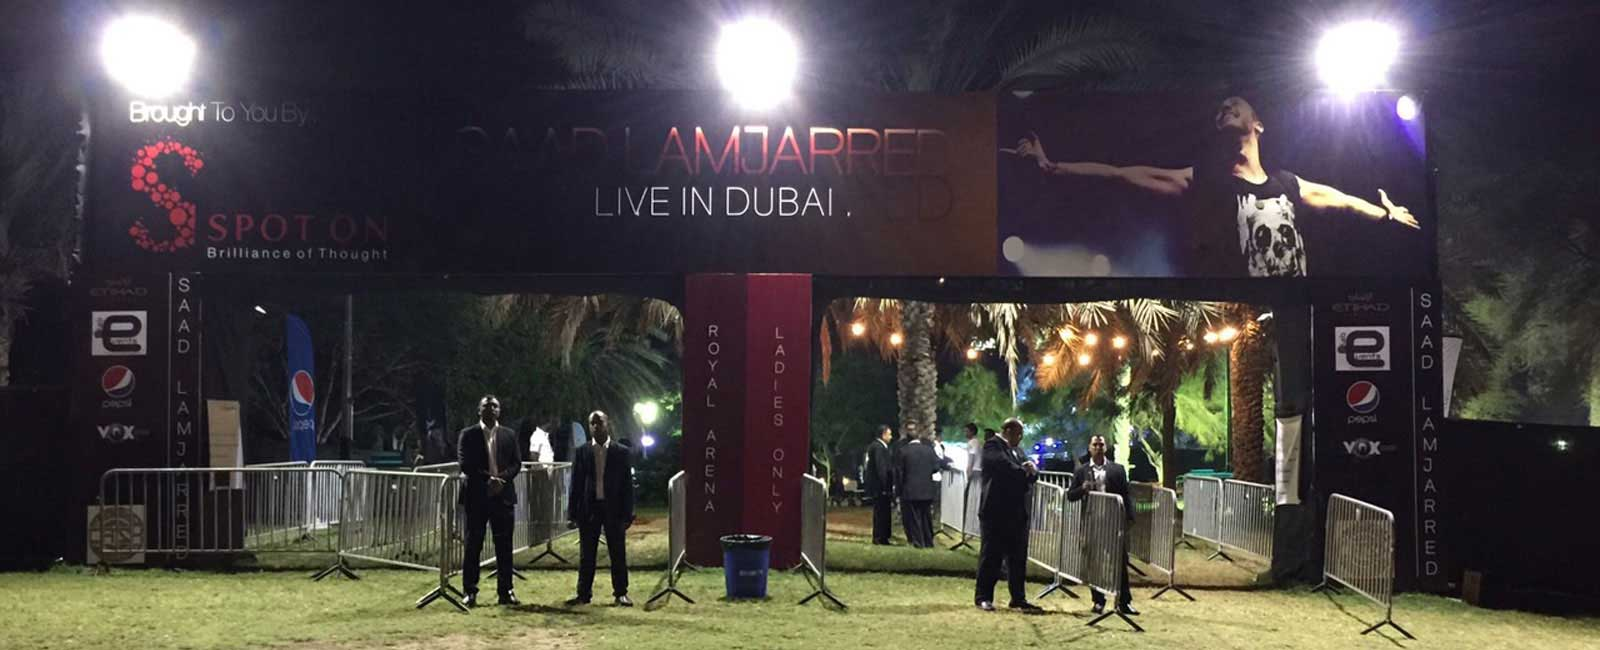 Security Guard Companies in Dubai